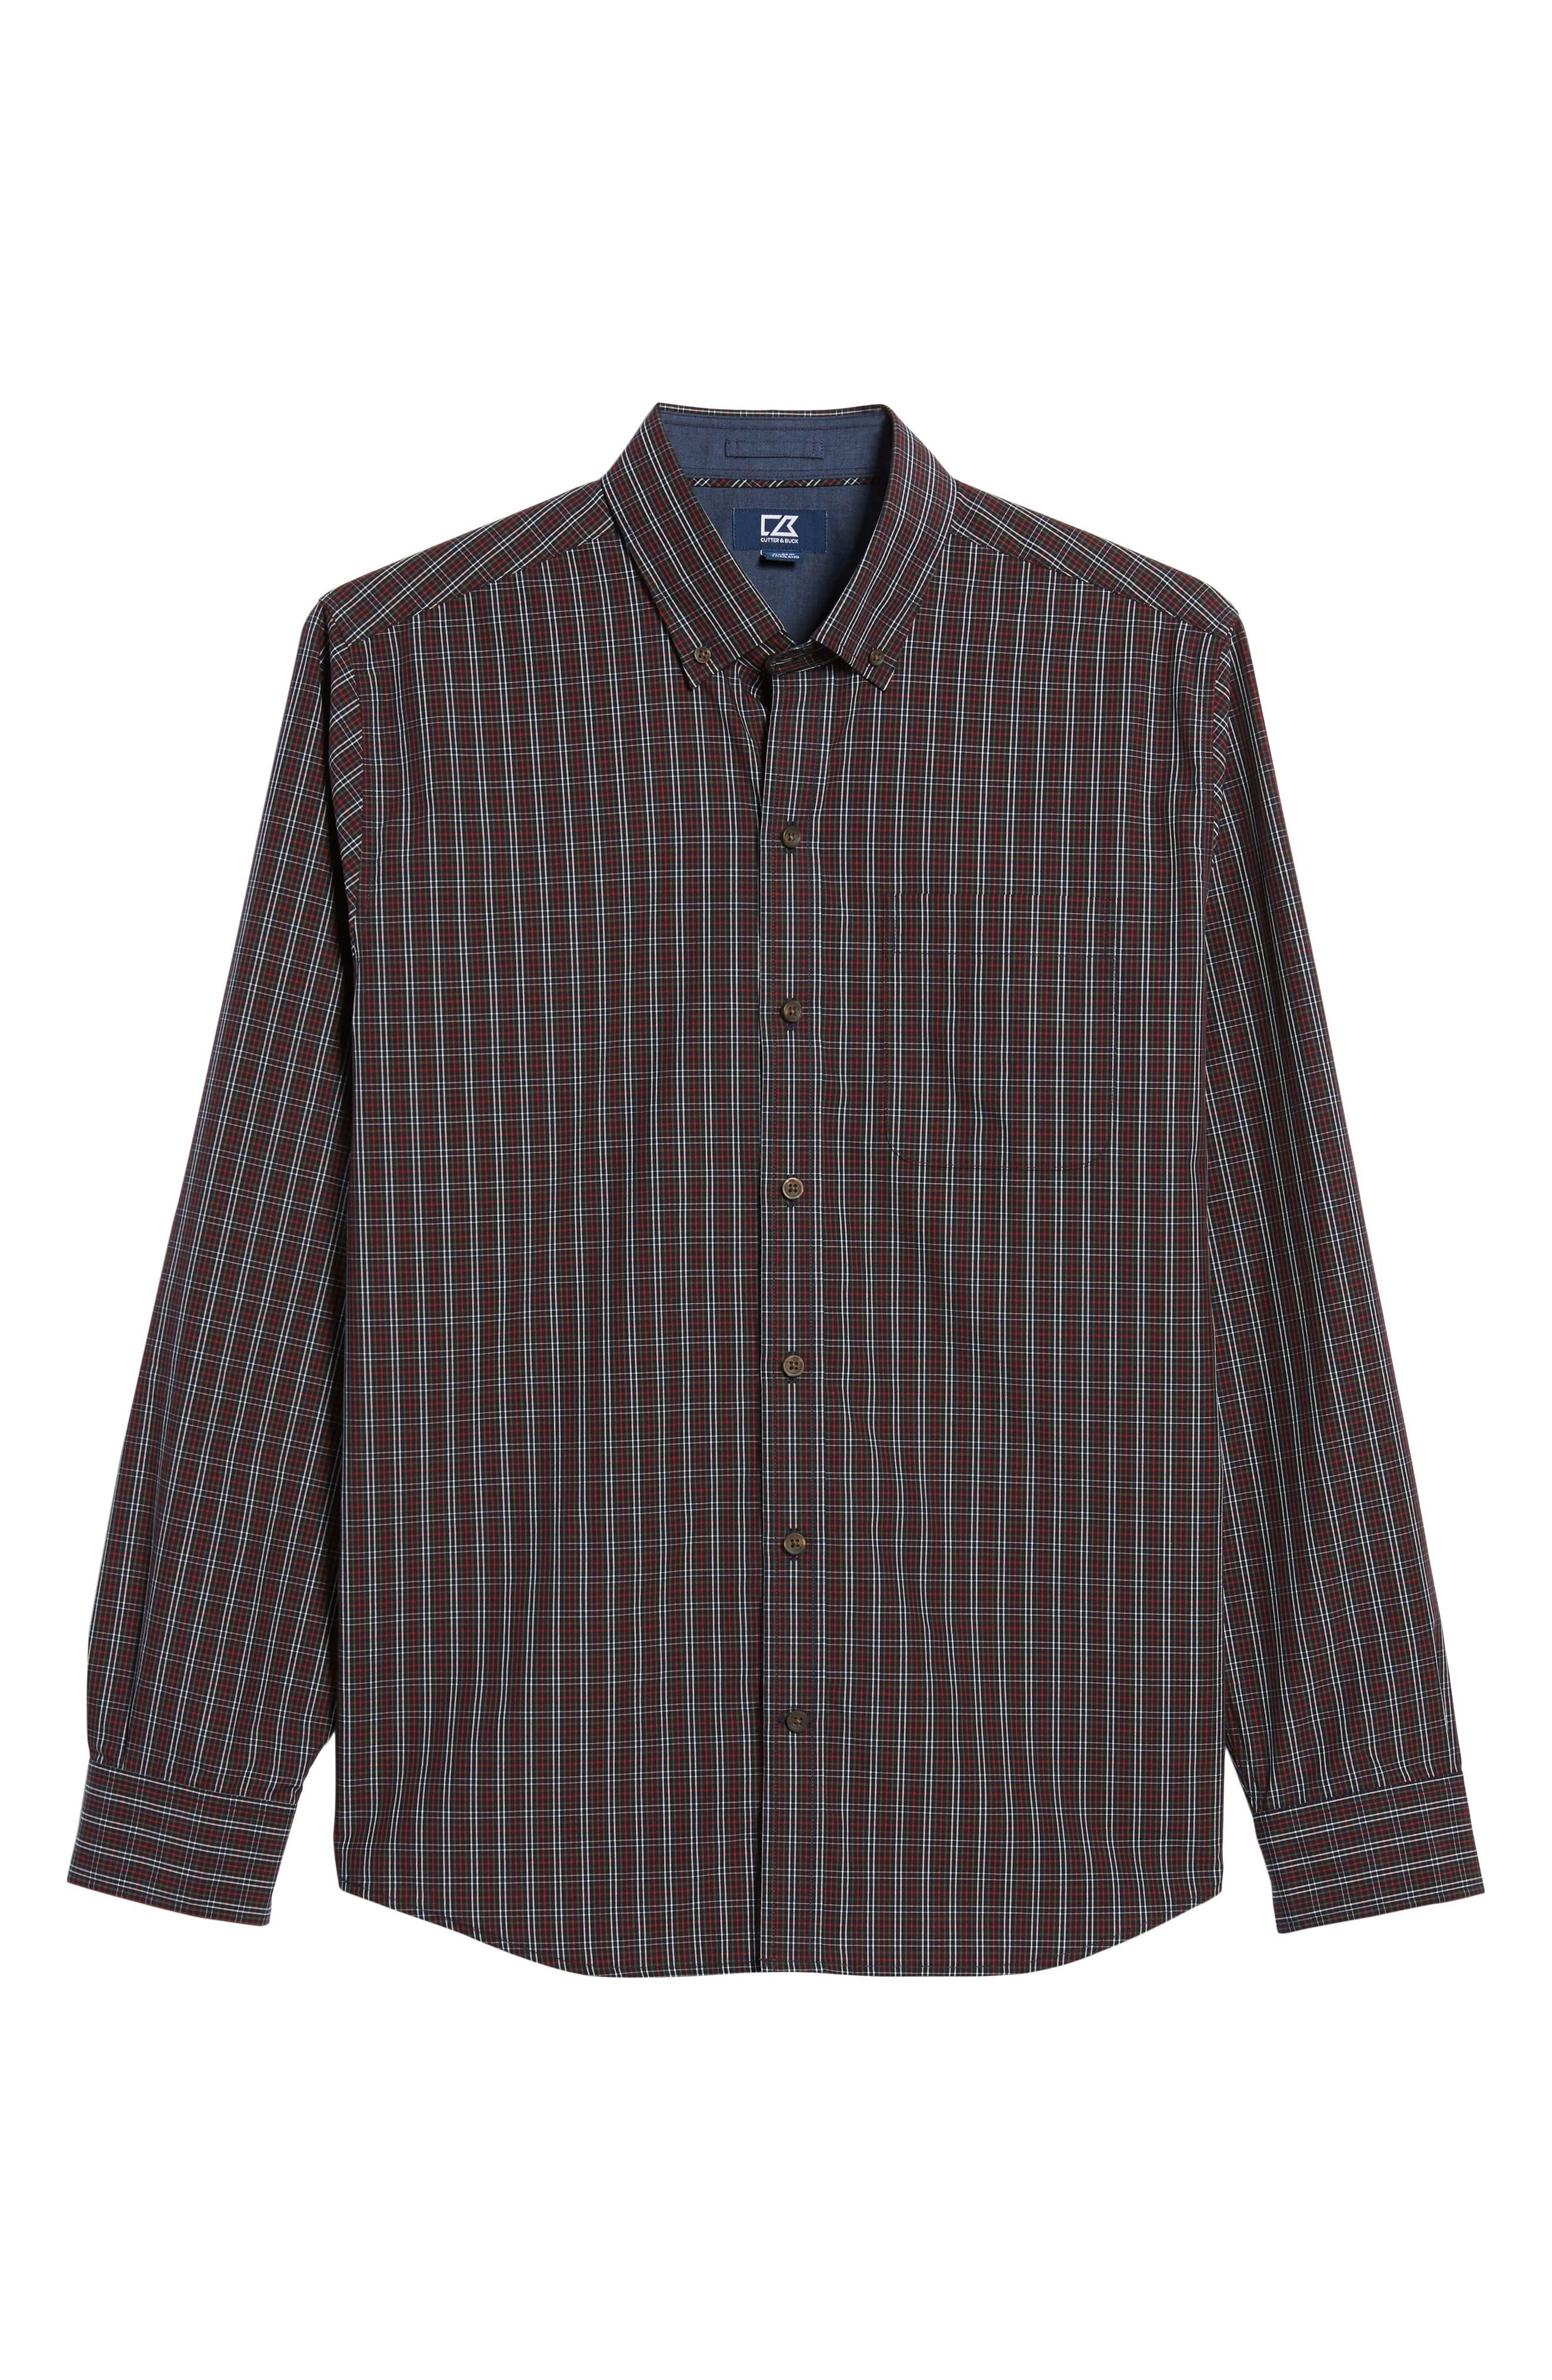 Cavanah Non-Iron Plaid Sport Shirt,                             Alternate thumbnail 6, color,                             493